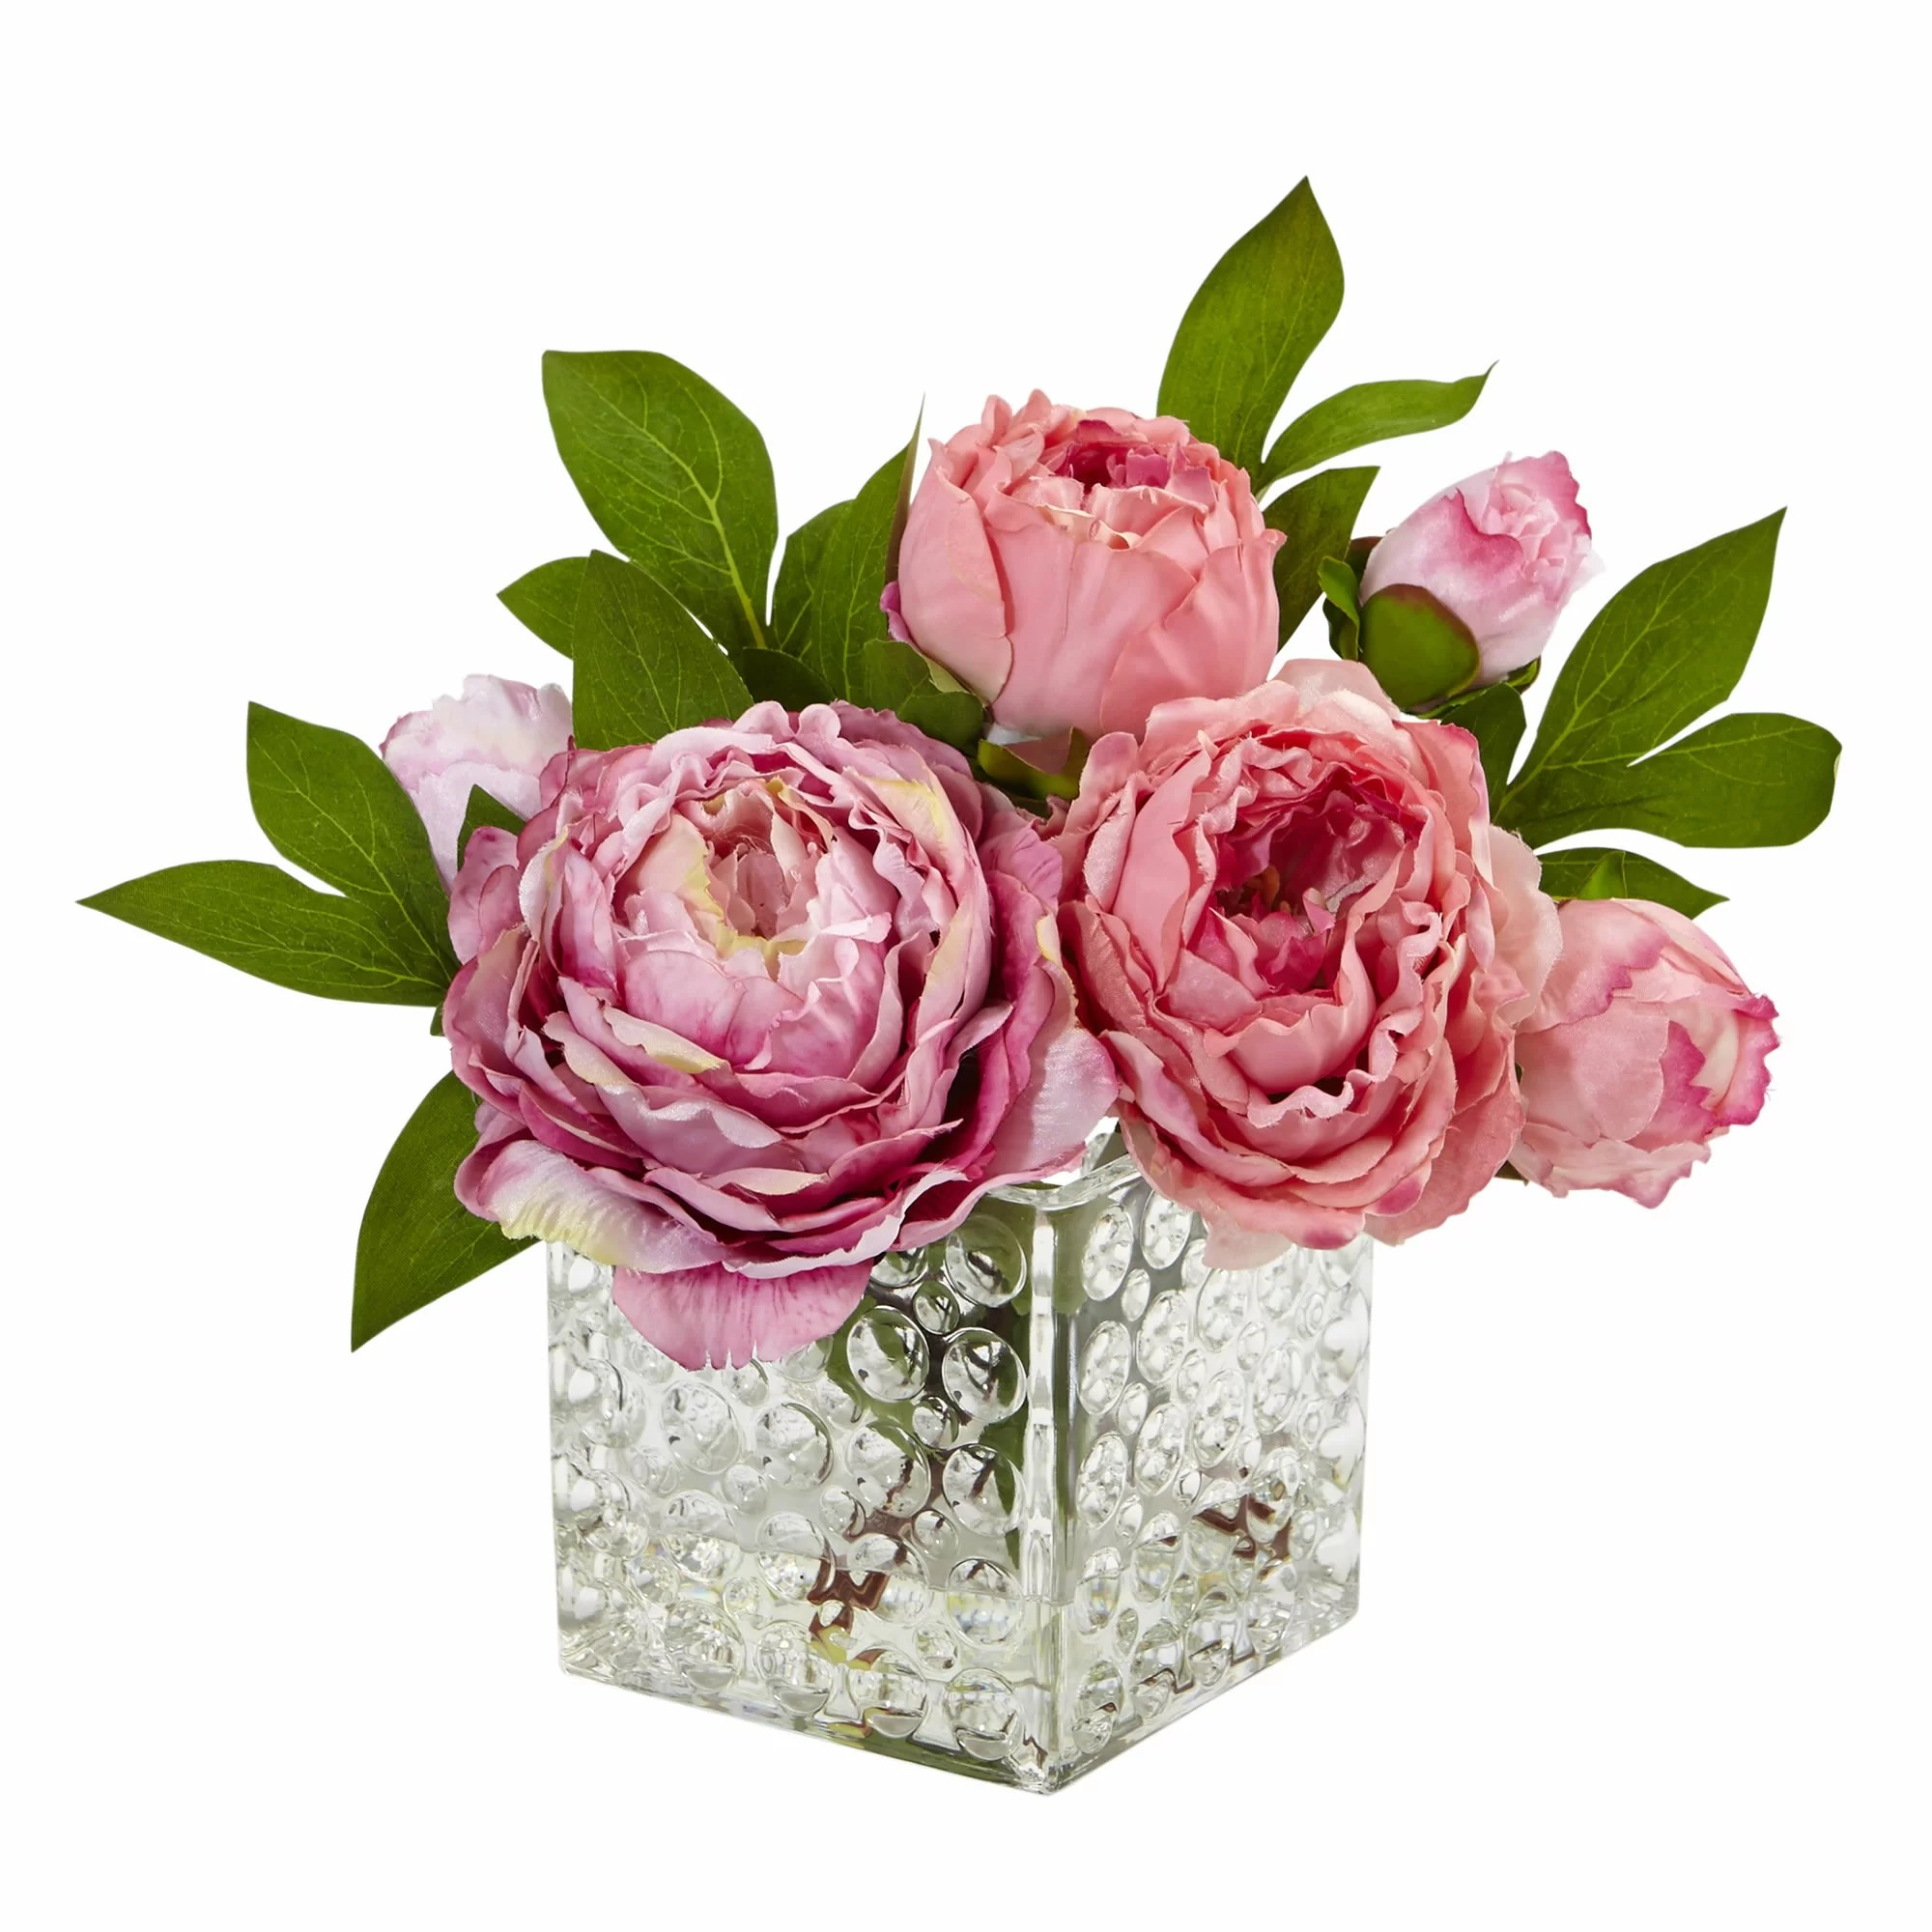 peony floral arrangements in